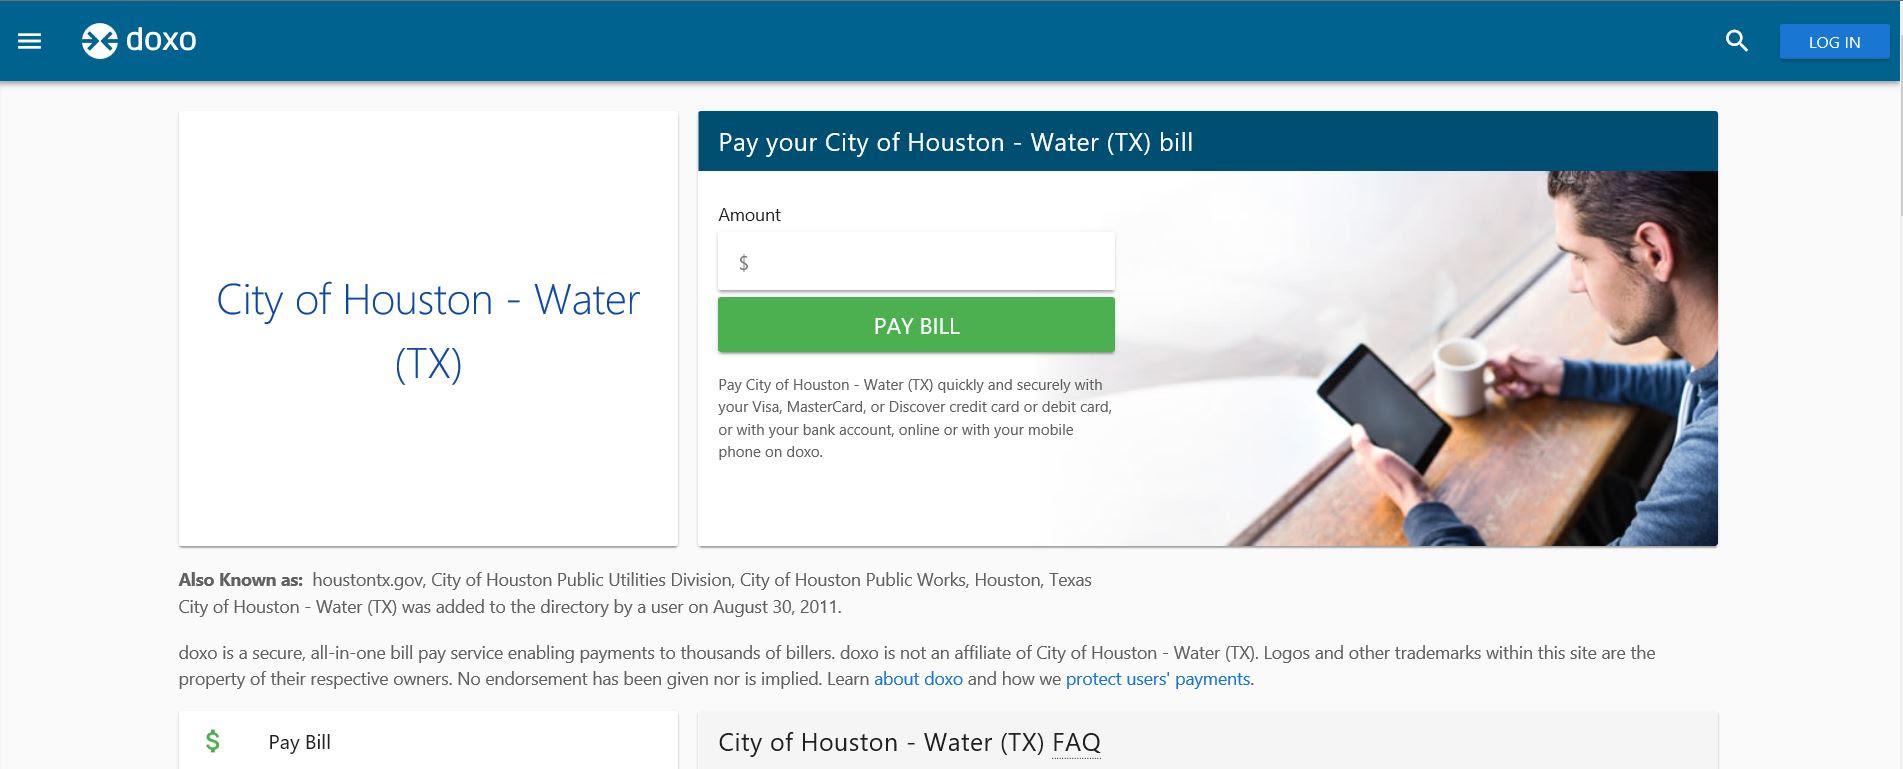 Suspicious Houston Water Bill Payment Website | News Blog